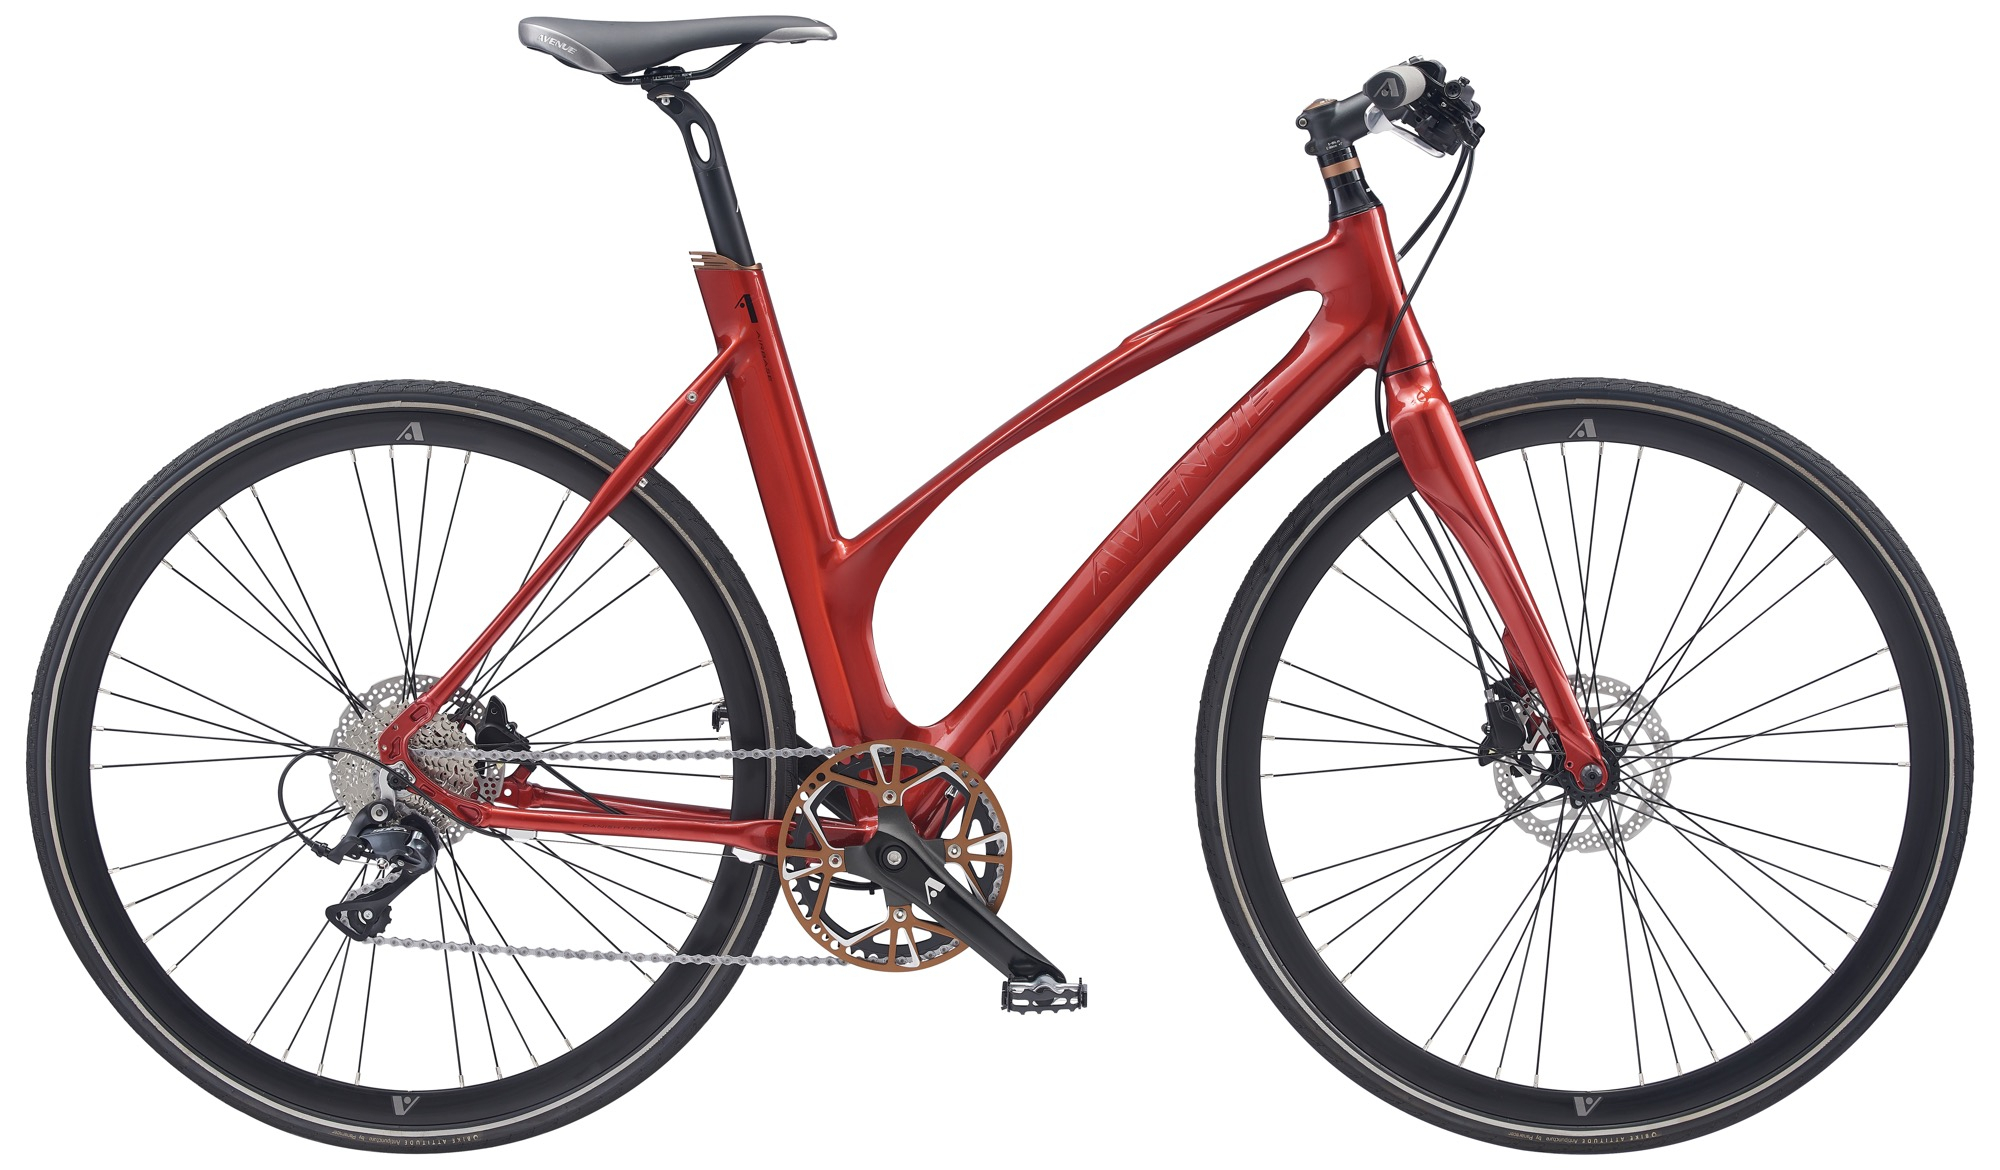 Pedalatleten Avenue Airbase Lady. 9 Speed Sora Hydr. Disc Shiny Red Rosa - 53Cm Cykler  Avenue Cykler